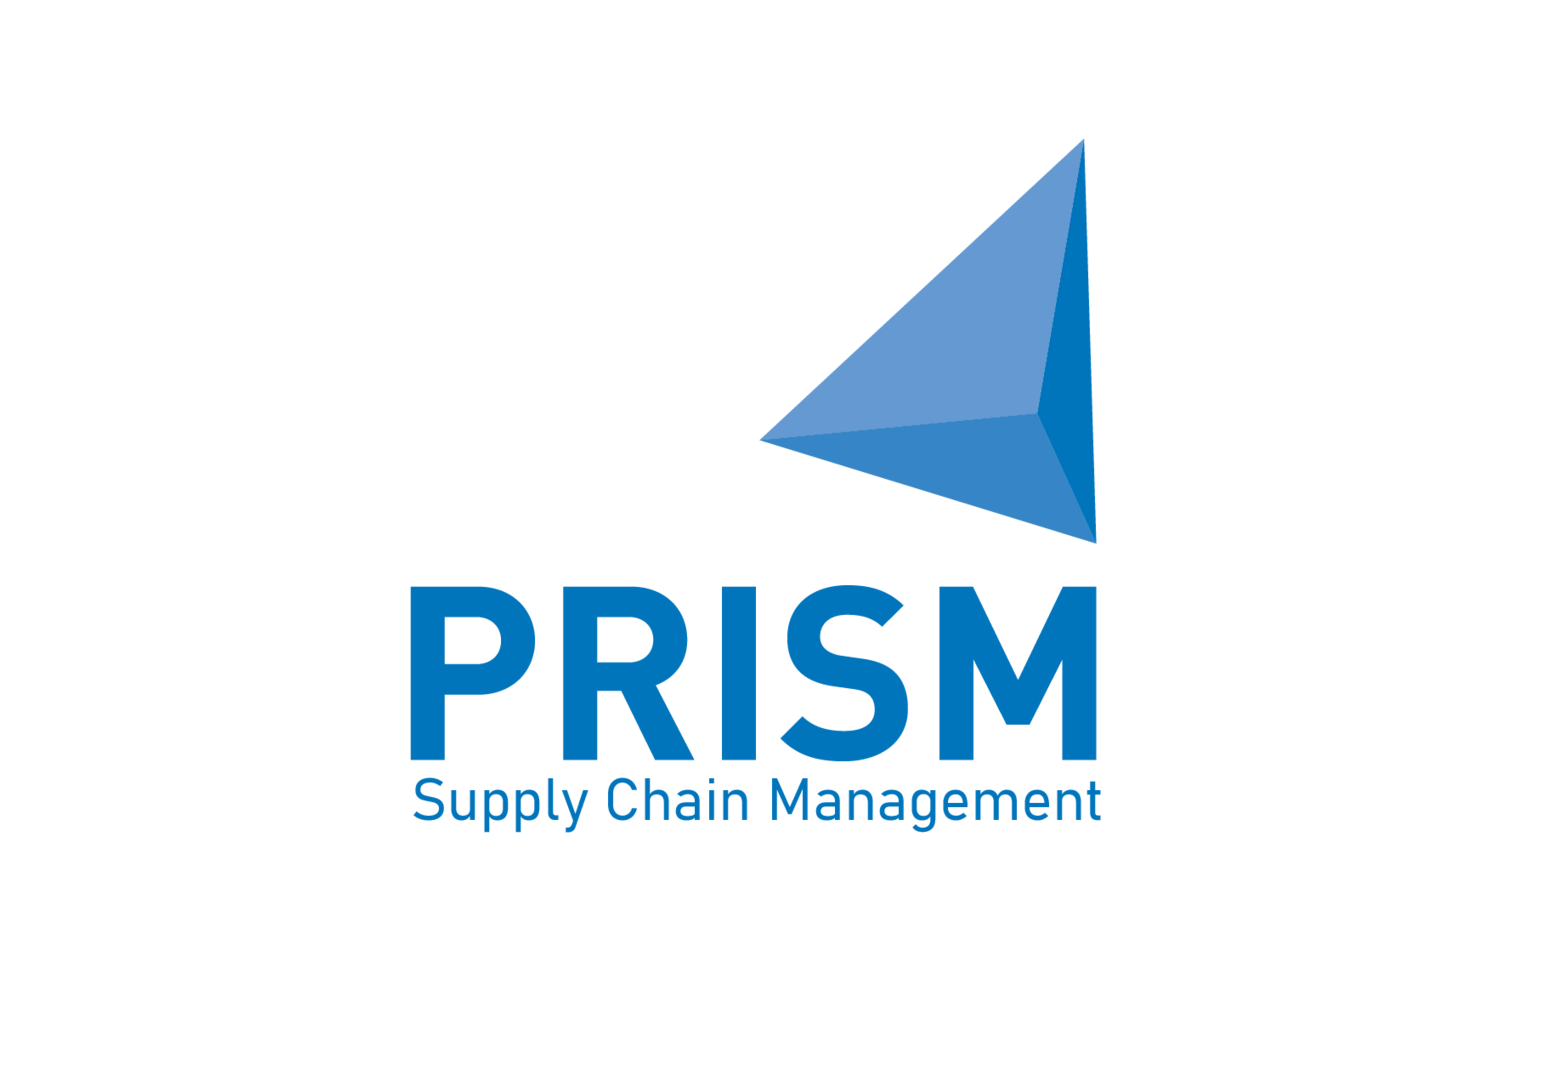 Bolloré deploys 4PL firm PRISM to manage operational risks effectively